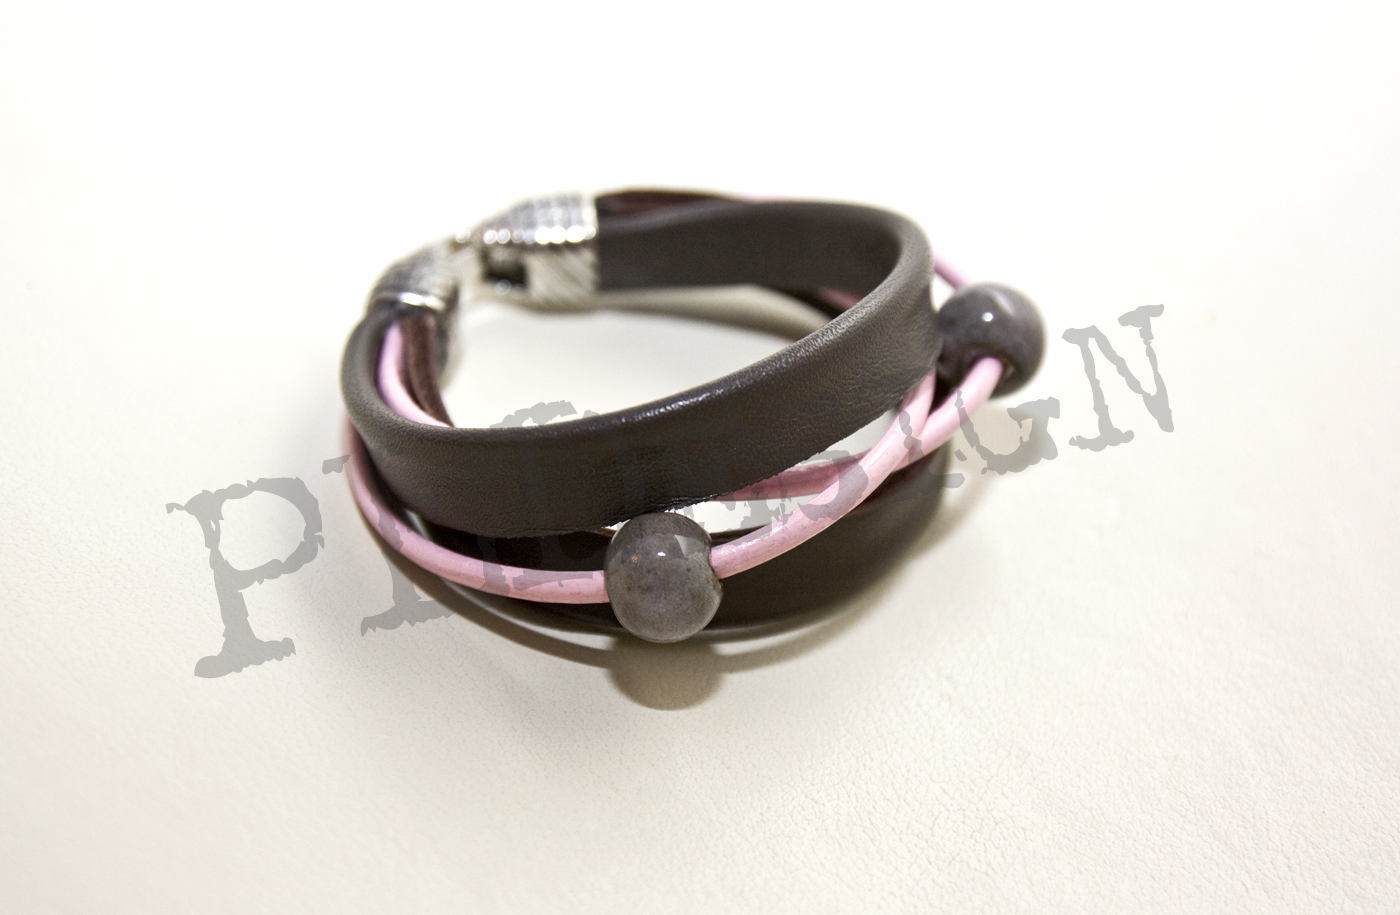 PLD PLDESIGN PLDSGN bracelets biżuteria design fashion